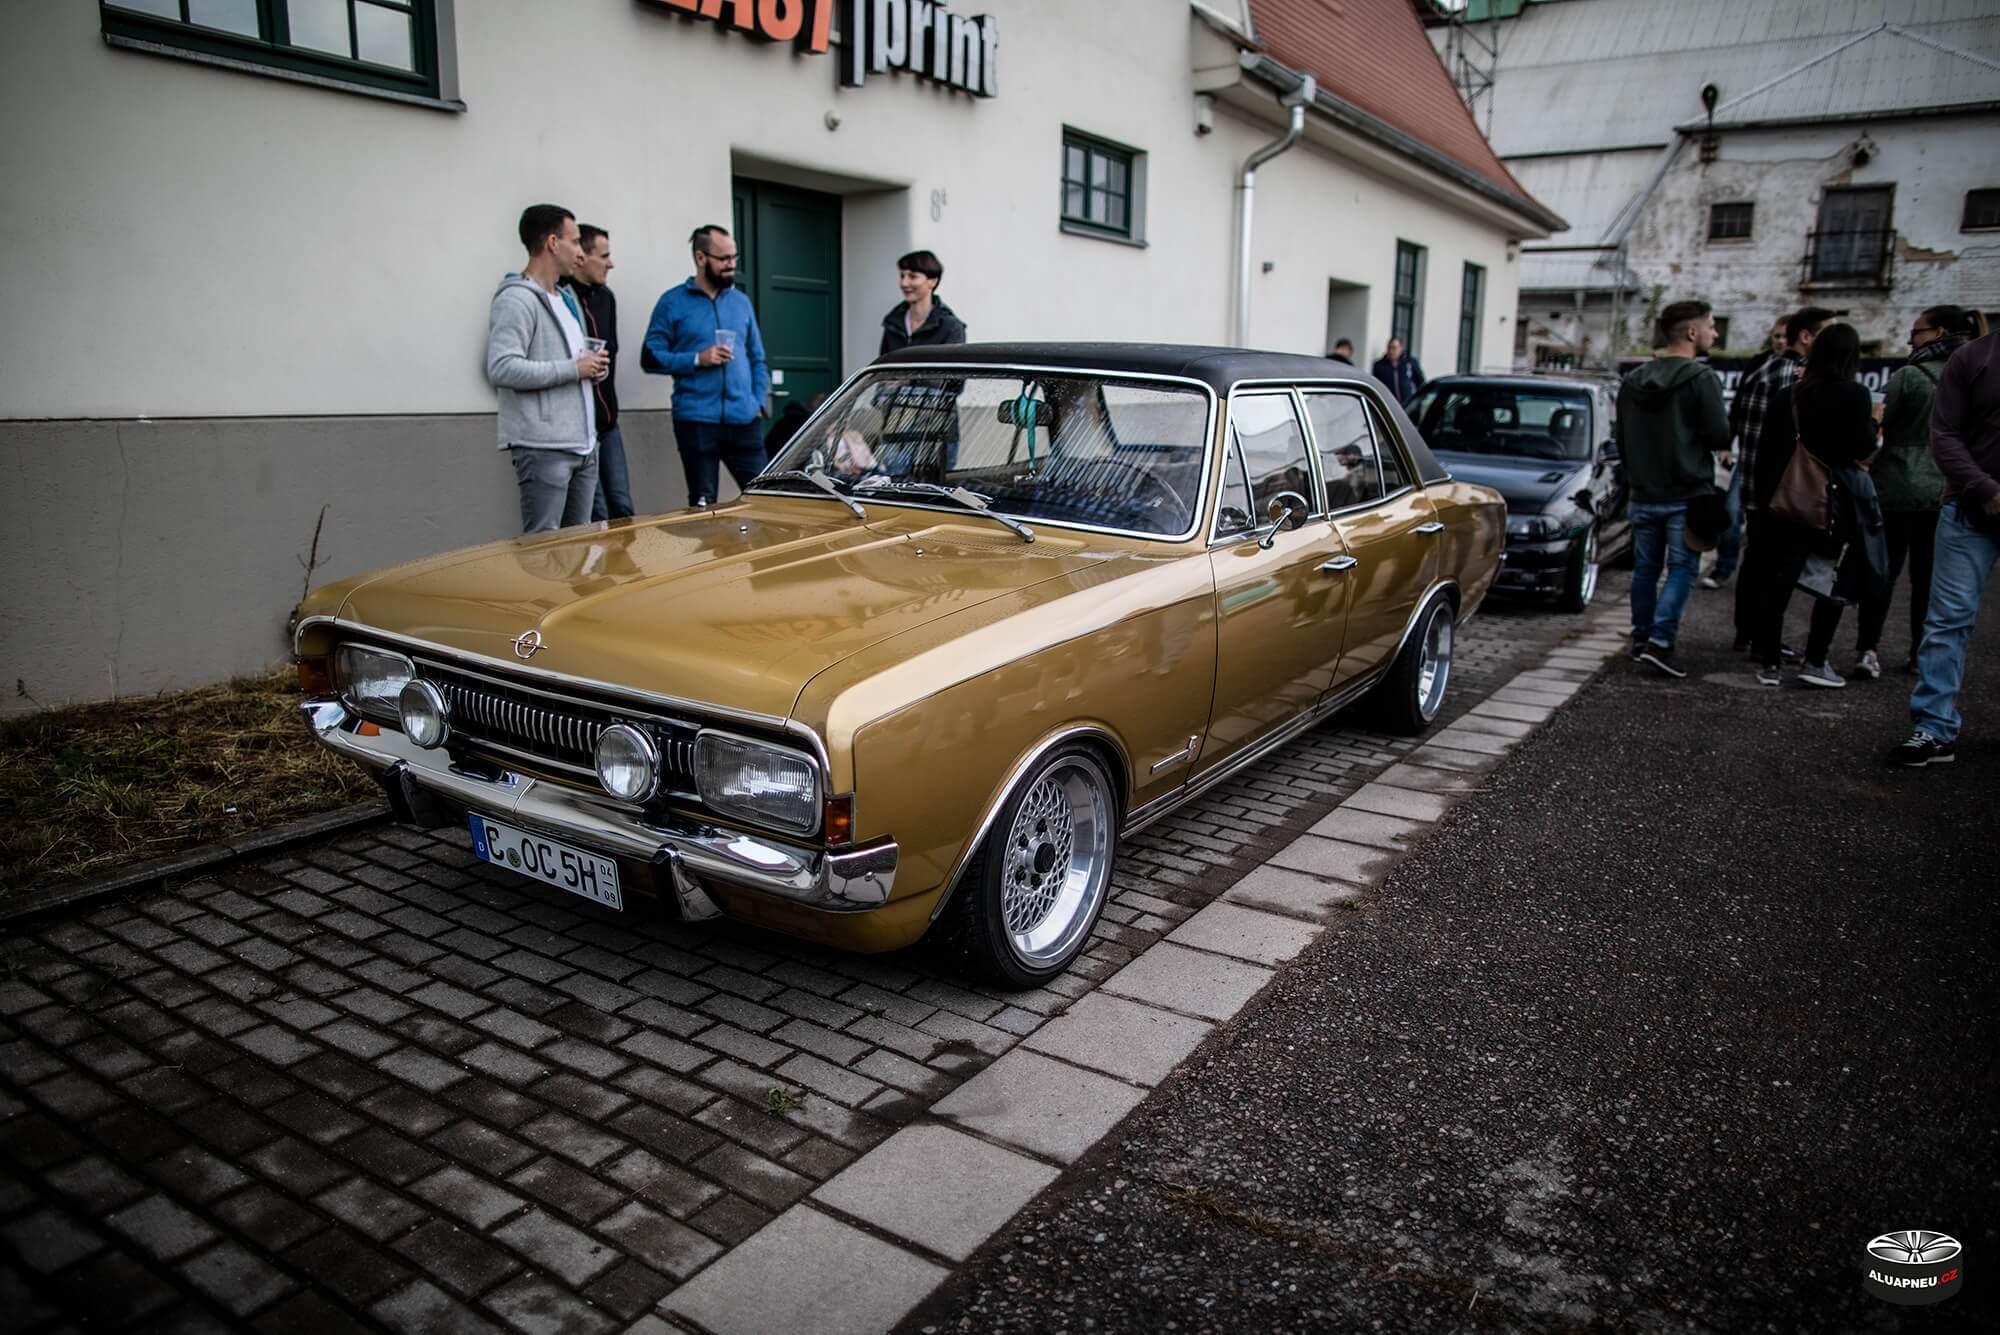 Opel Commodore alu kola s leštěným límcem - XS Classic Carnight 5.0 - Drážďany tuning sraz 2019 - www.aluapneu.cz